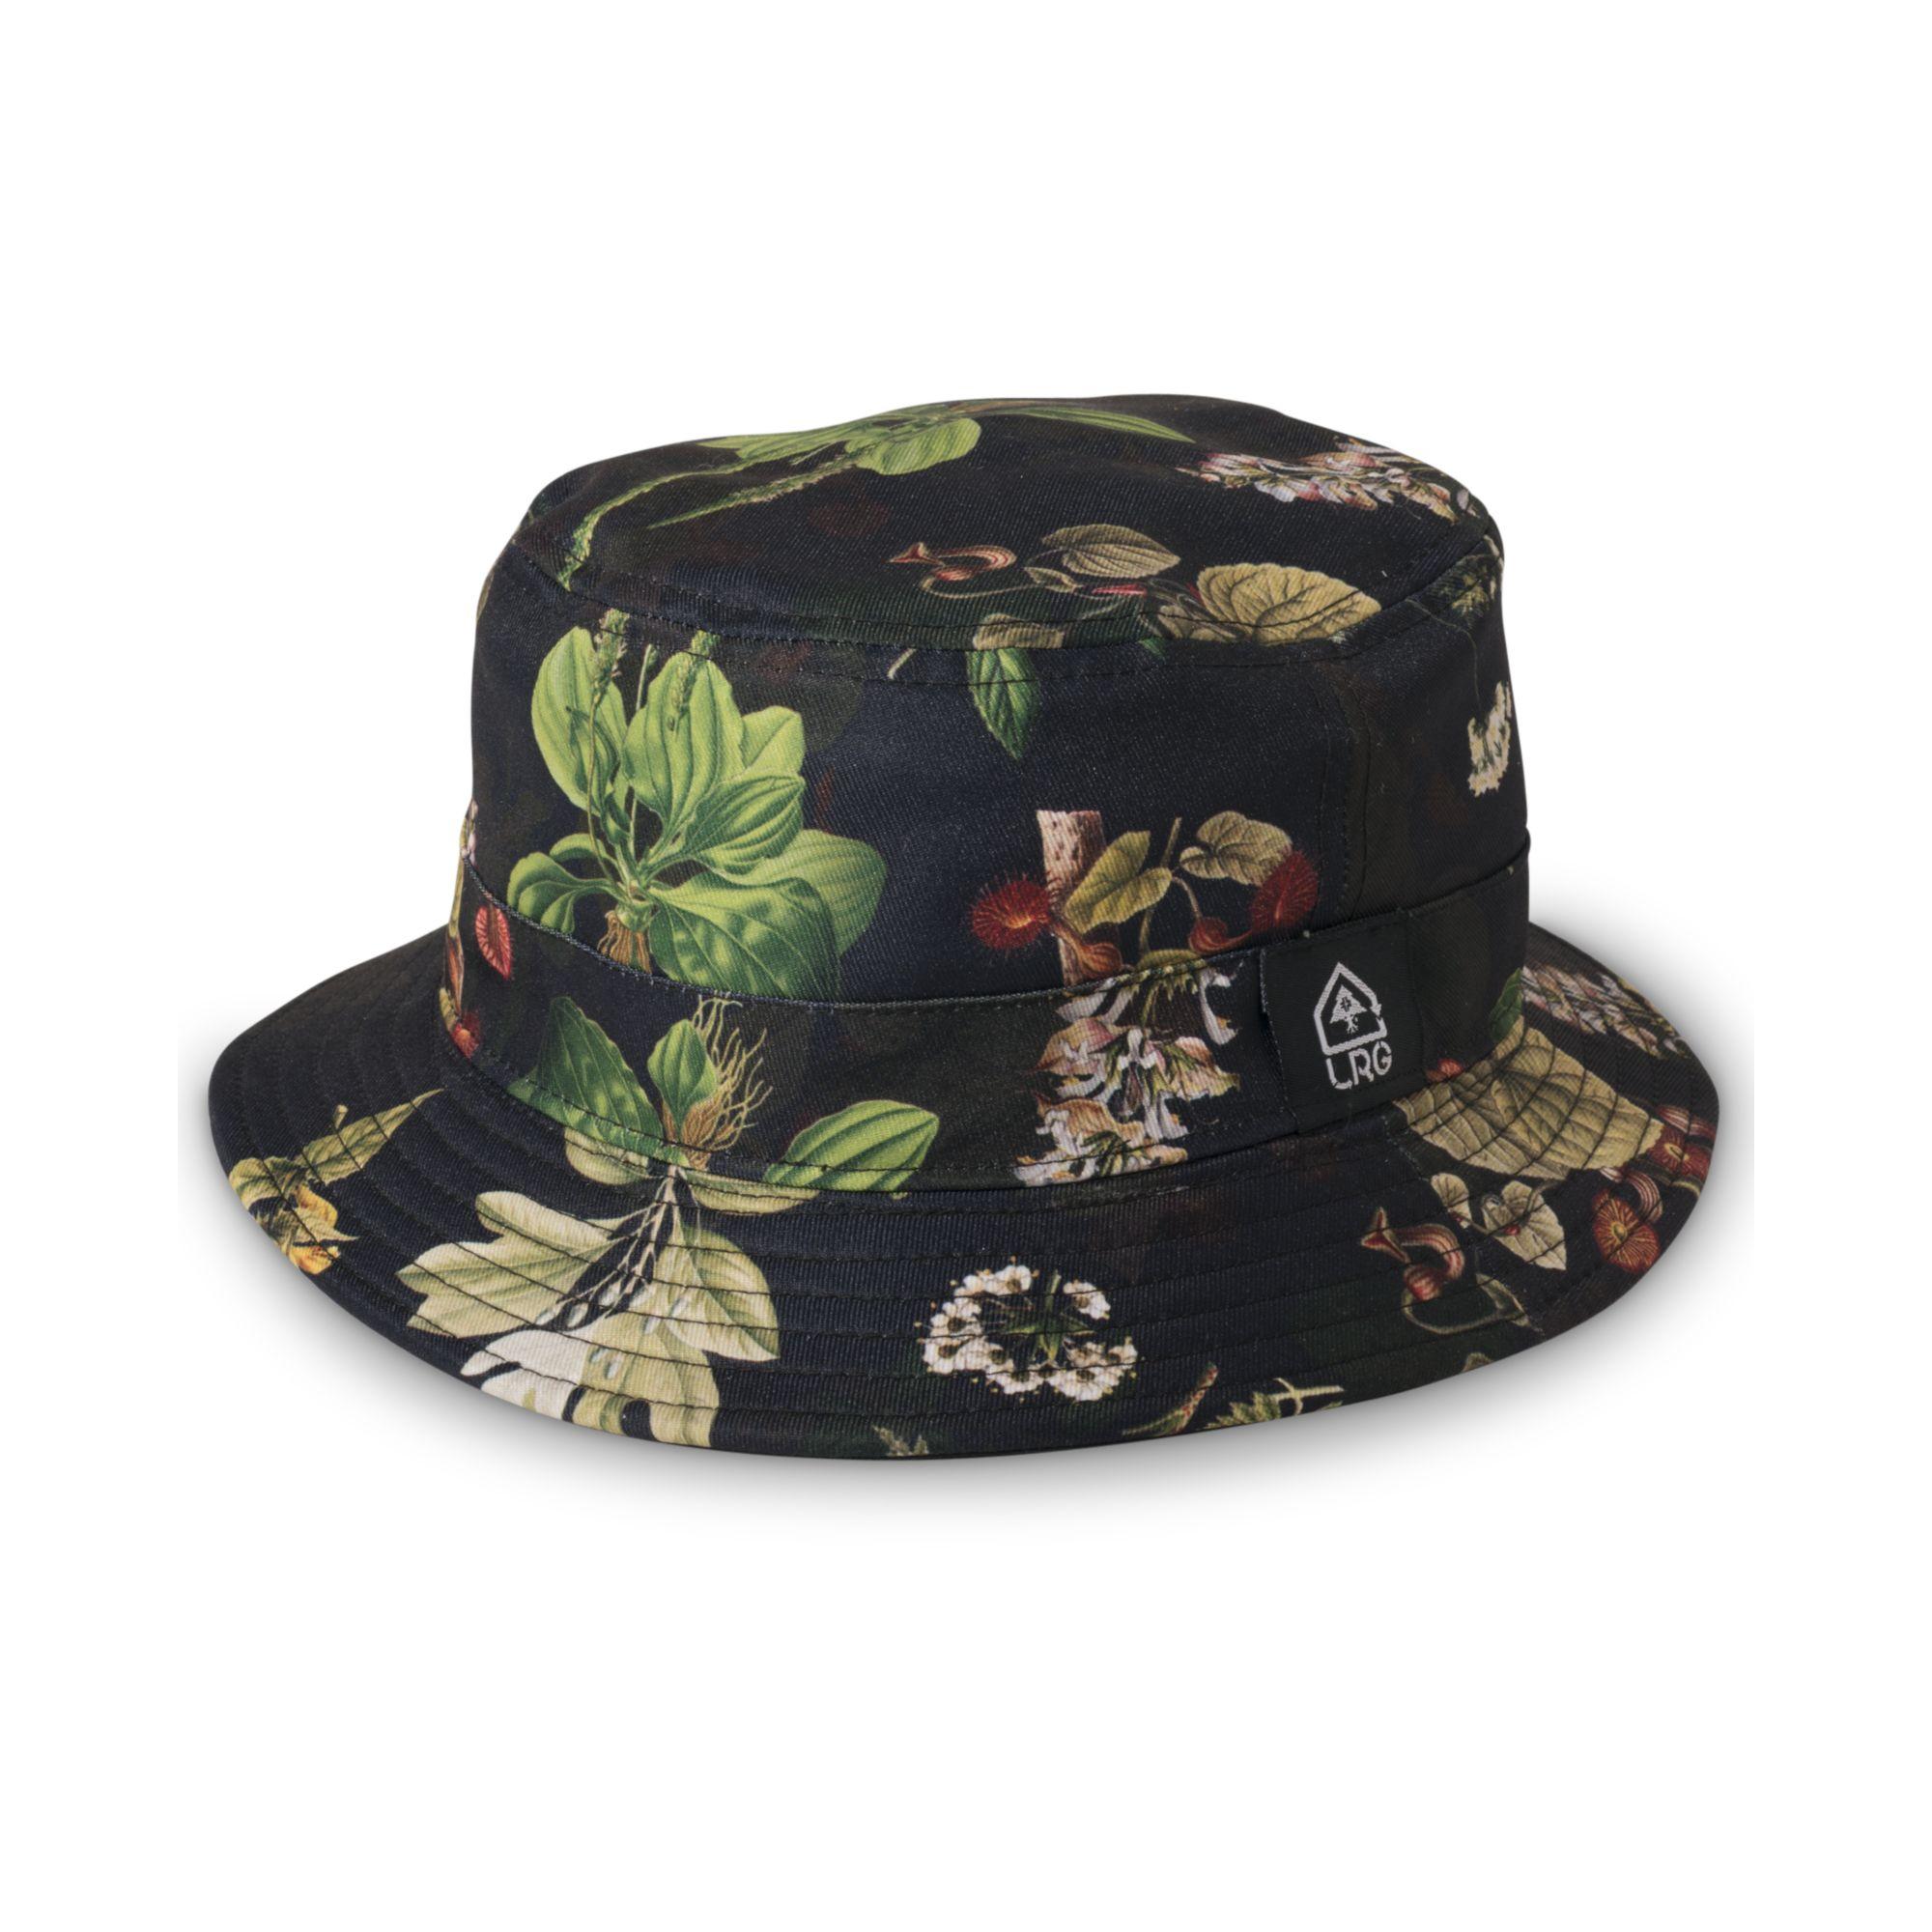 Lyst - LRG Floral Print Bucket Hat in Black for Men f89b99eccc3a